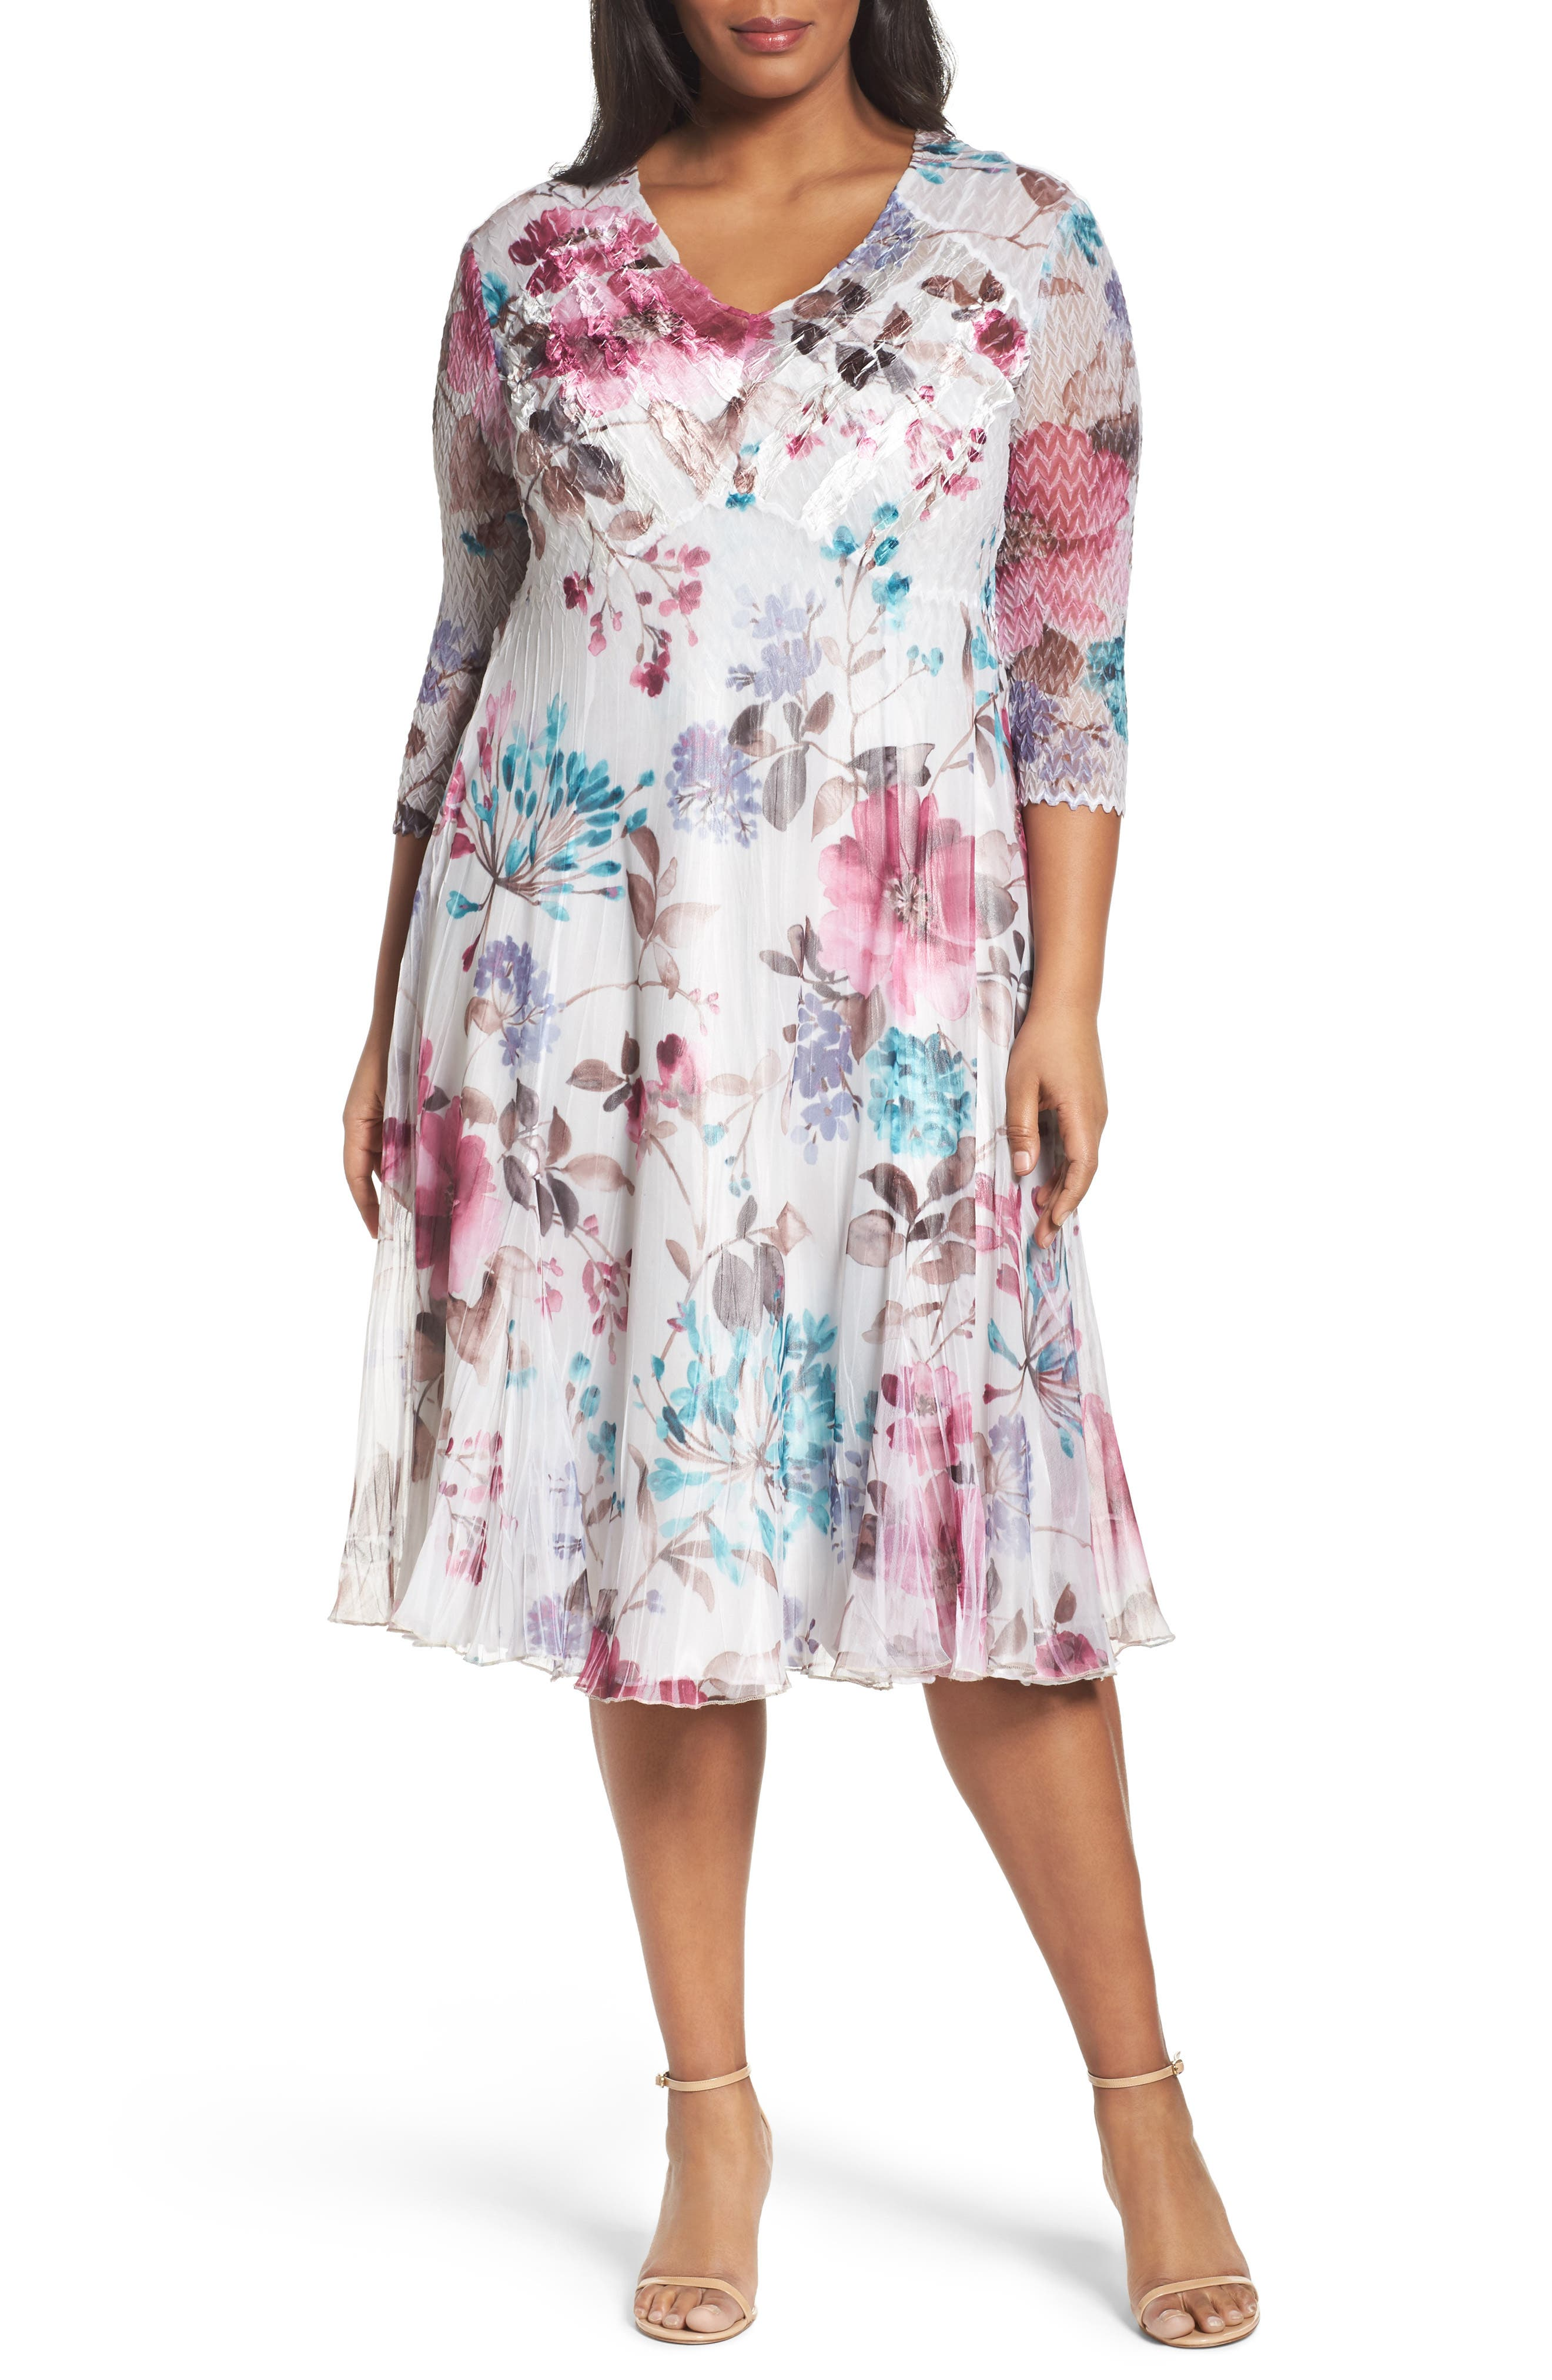 Alternate Image 1 Selected - Komarov Floral Chiffon & Charmeuse A-Line Dress (Plus Size)